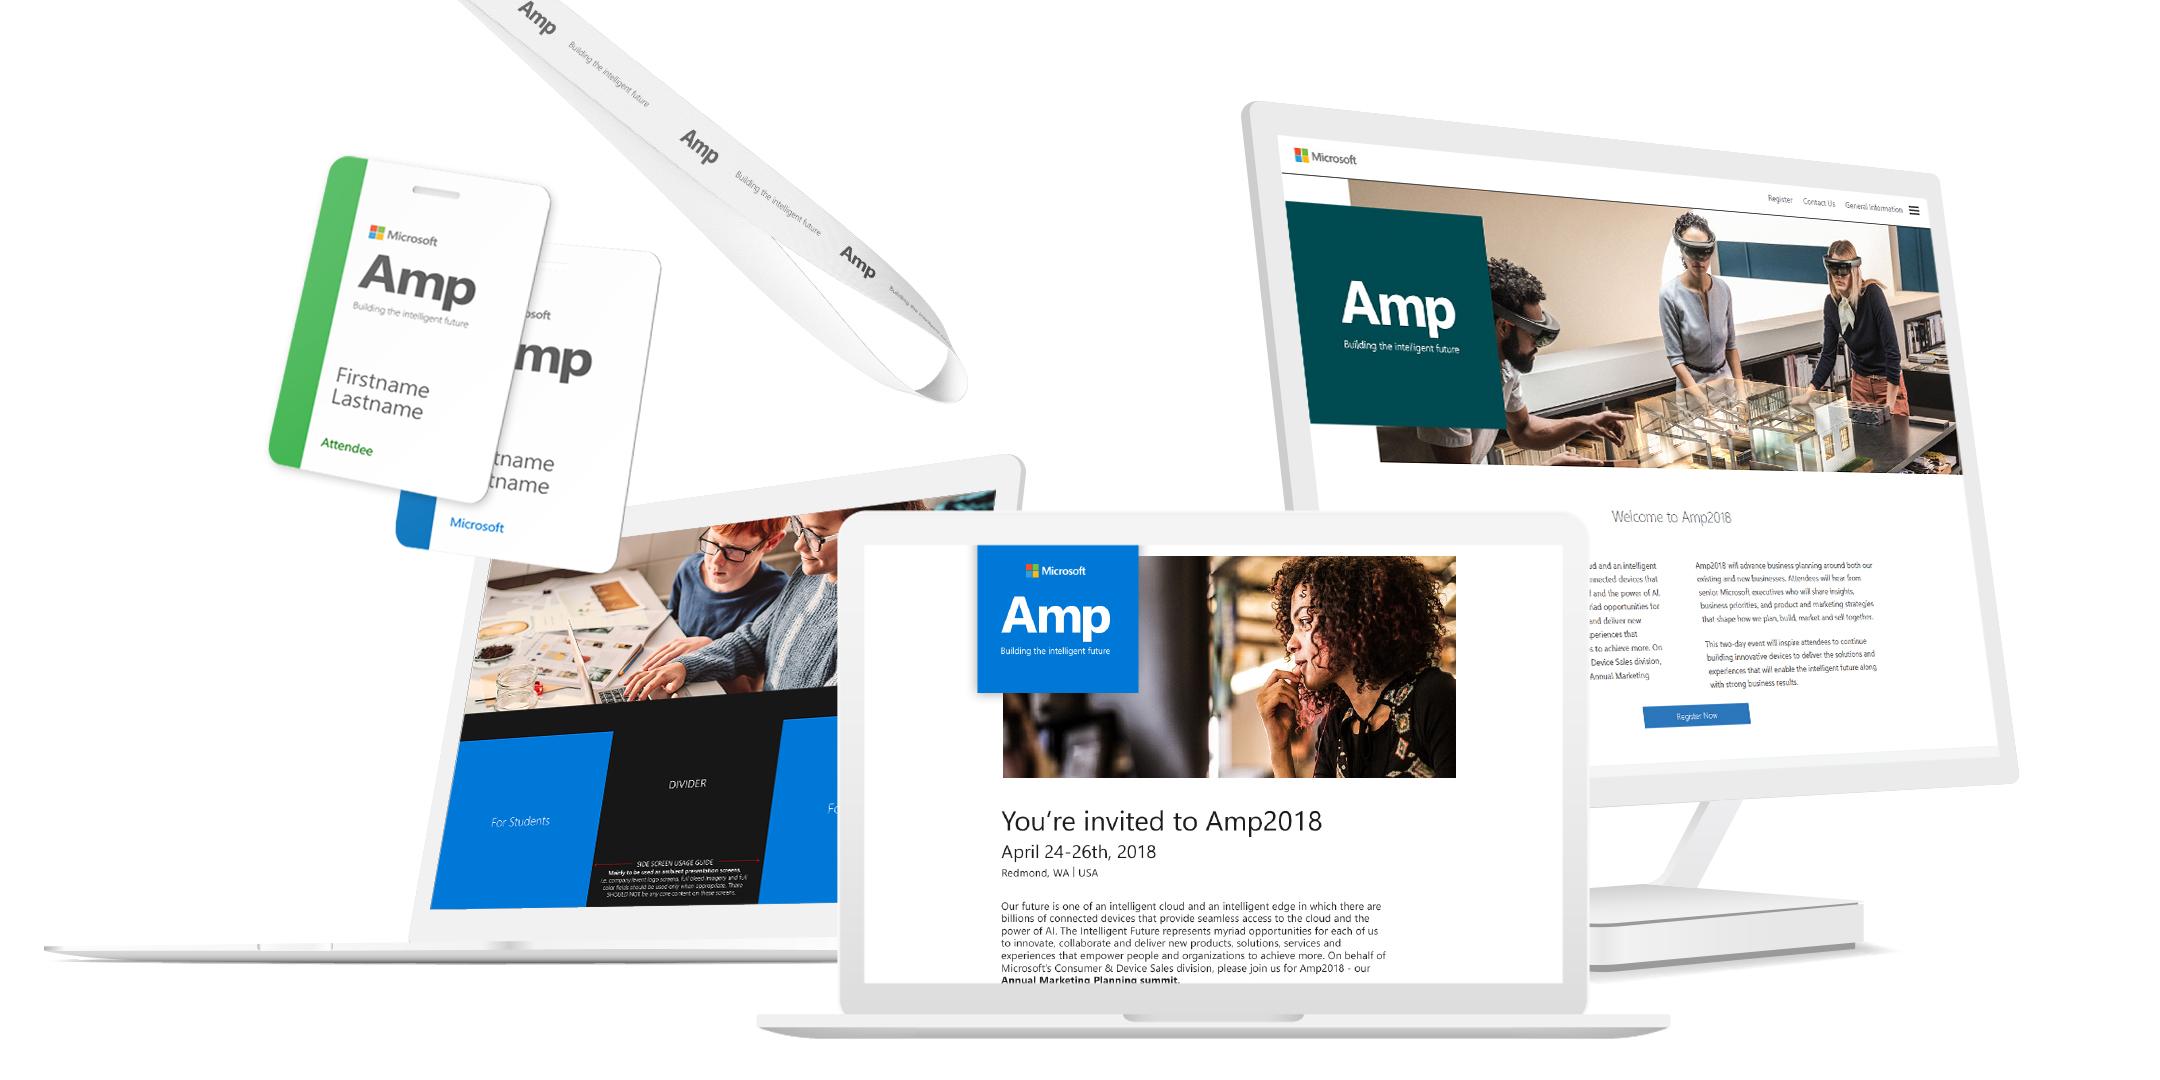 amp2018-event-assets-1.jpg